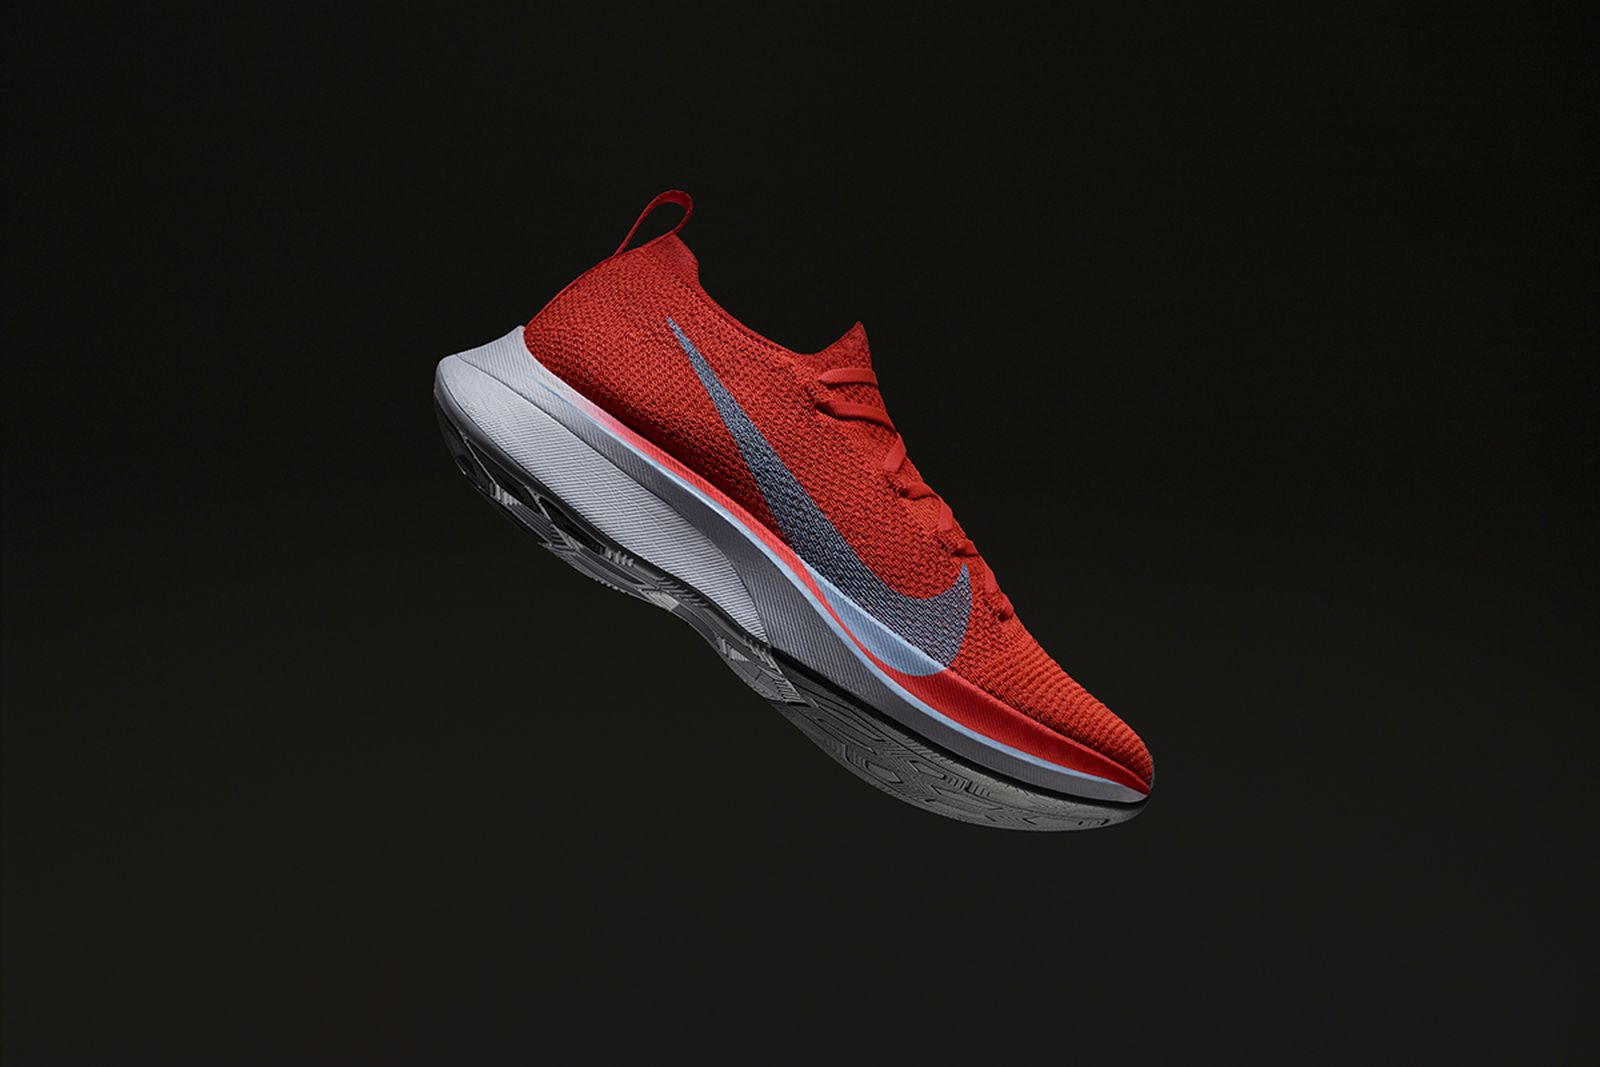 nike zoom vaporfly 4 flyknit zoom fly flyknit release date price Adidas Hoka One One New Balance